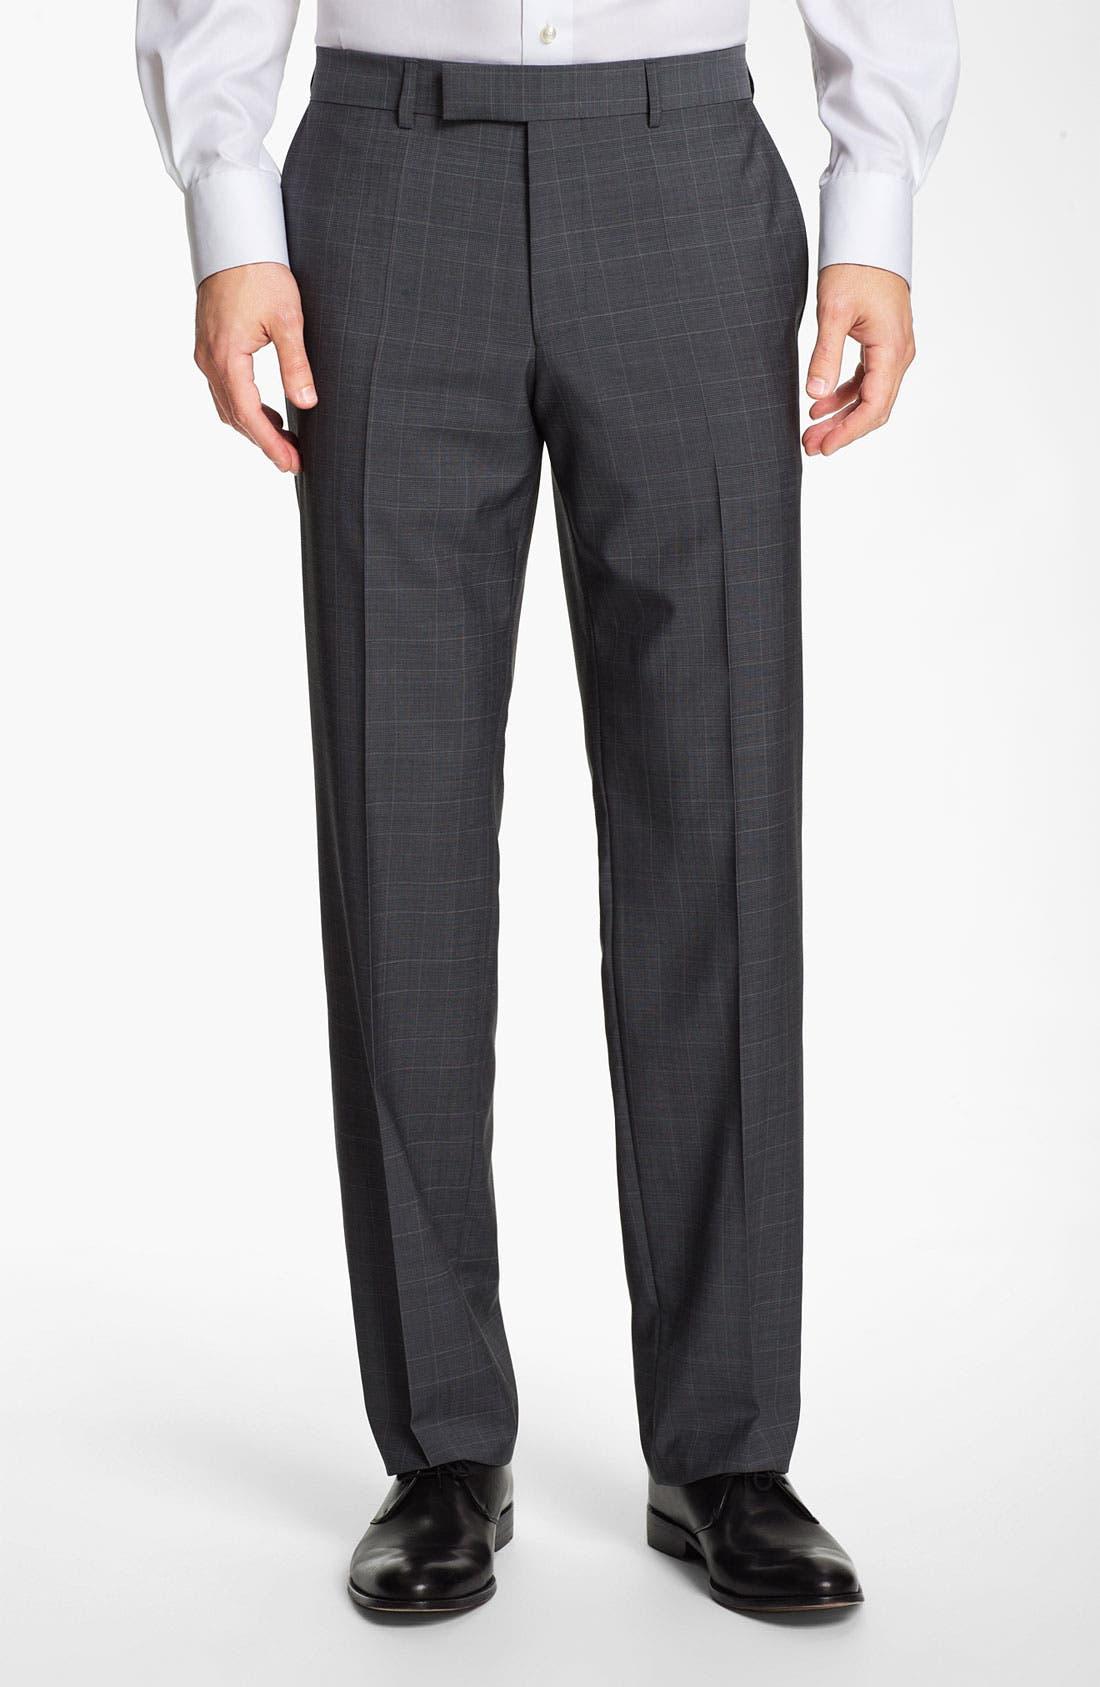 BOSS Black 'Pasini/Movie' Plaid Suit,                             Alternate thumbnail 4, color,                             030